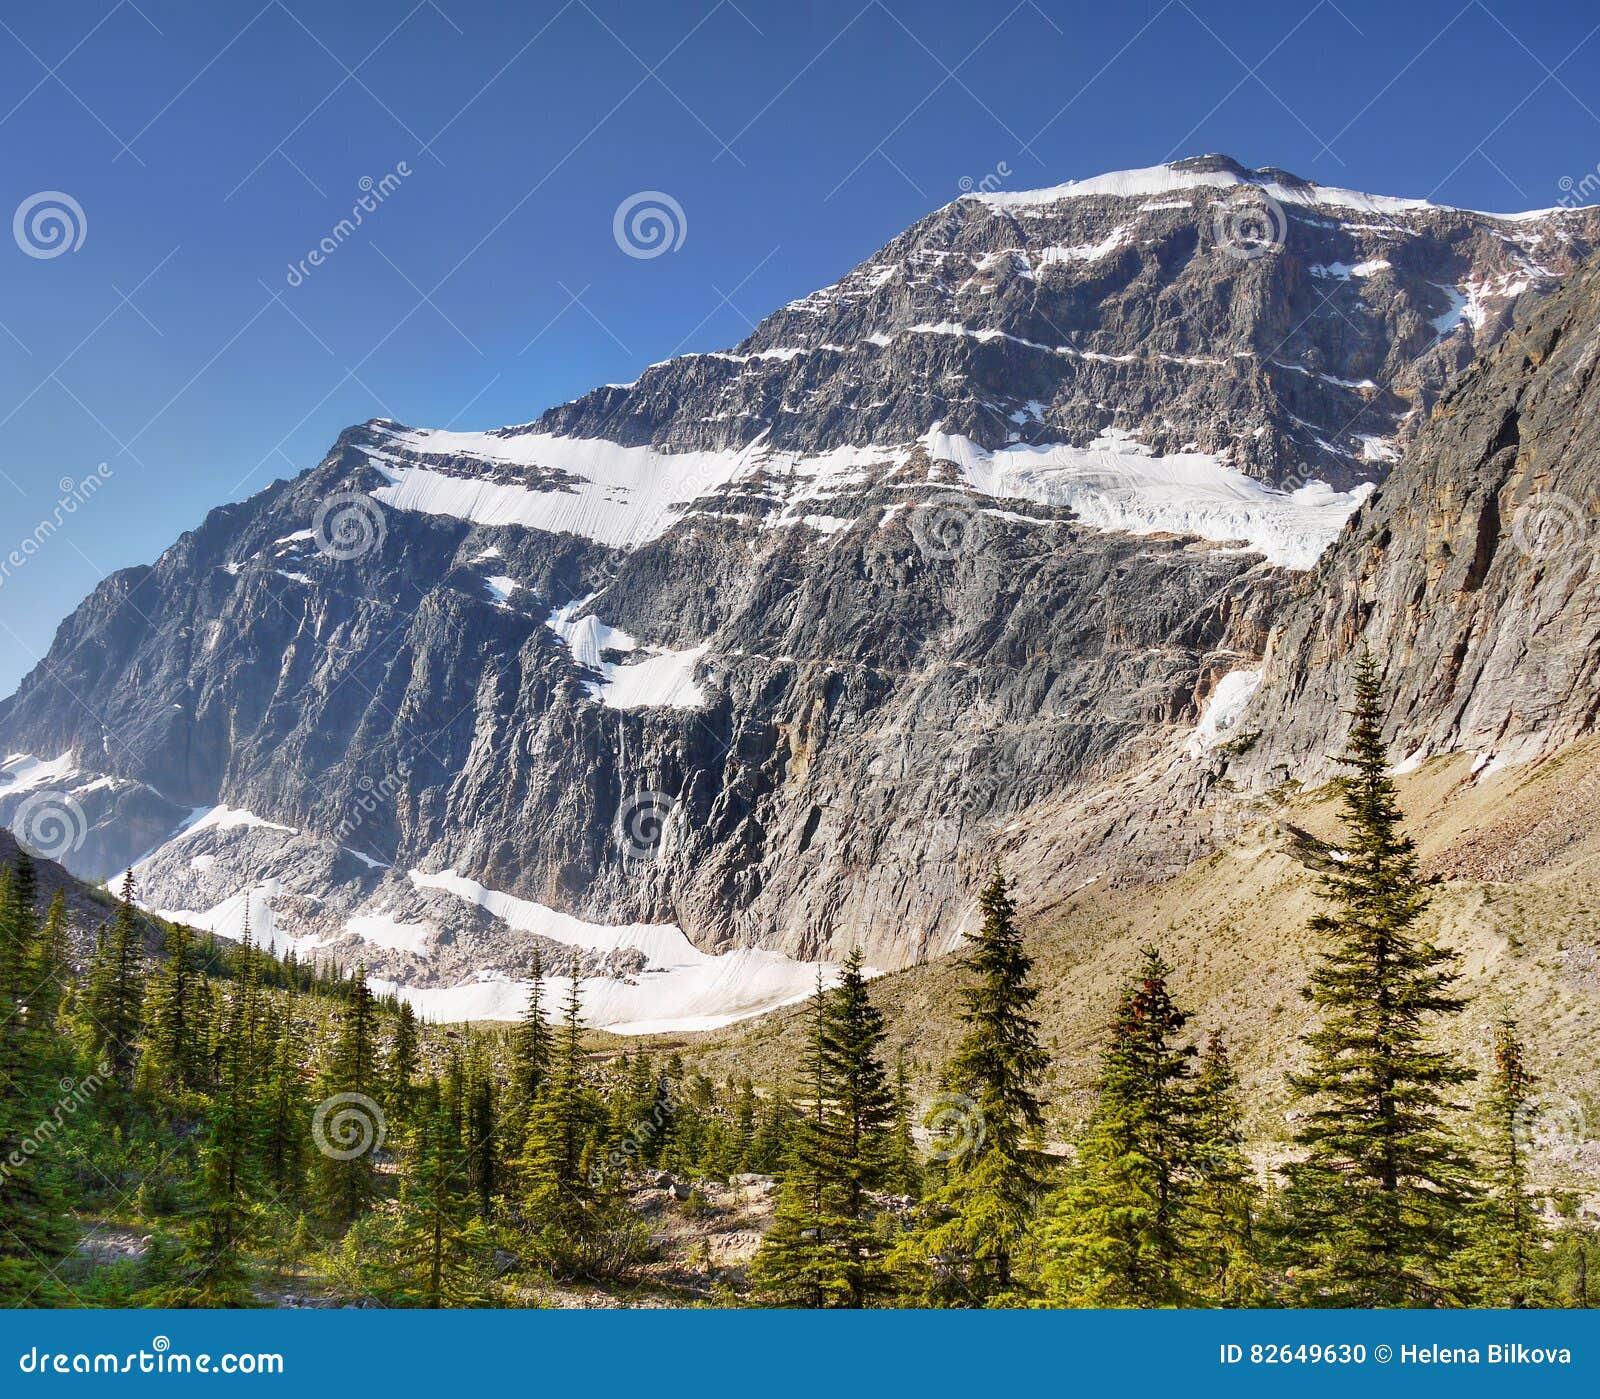 Mountain Range Landscape view, National Park, Canada